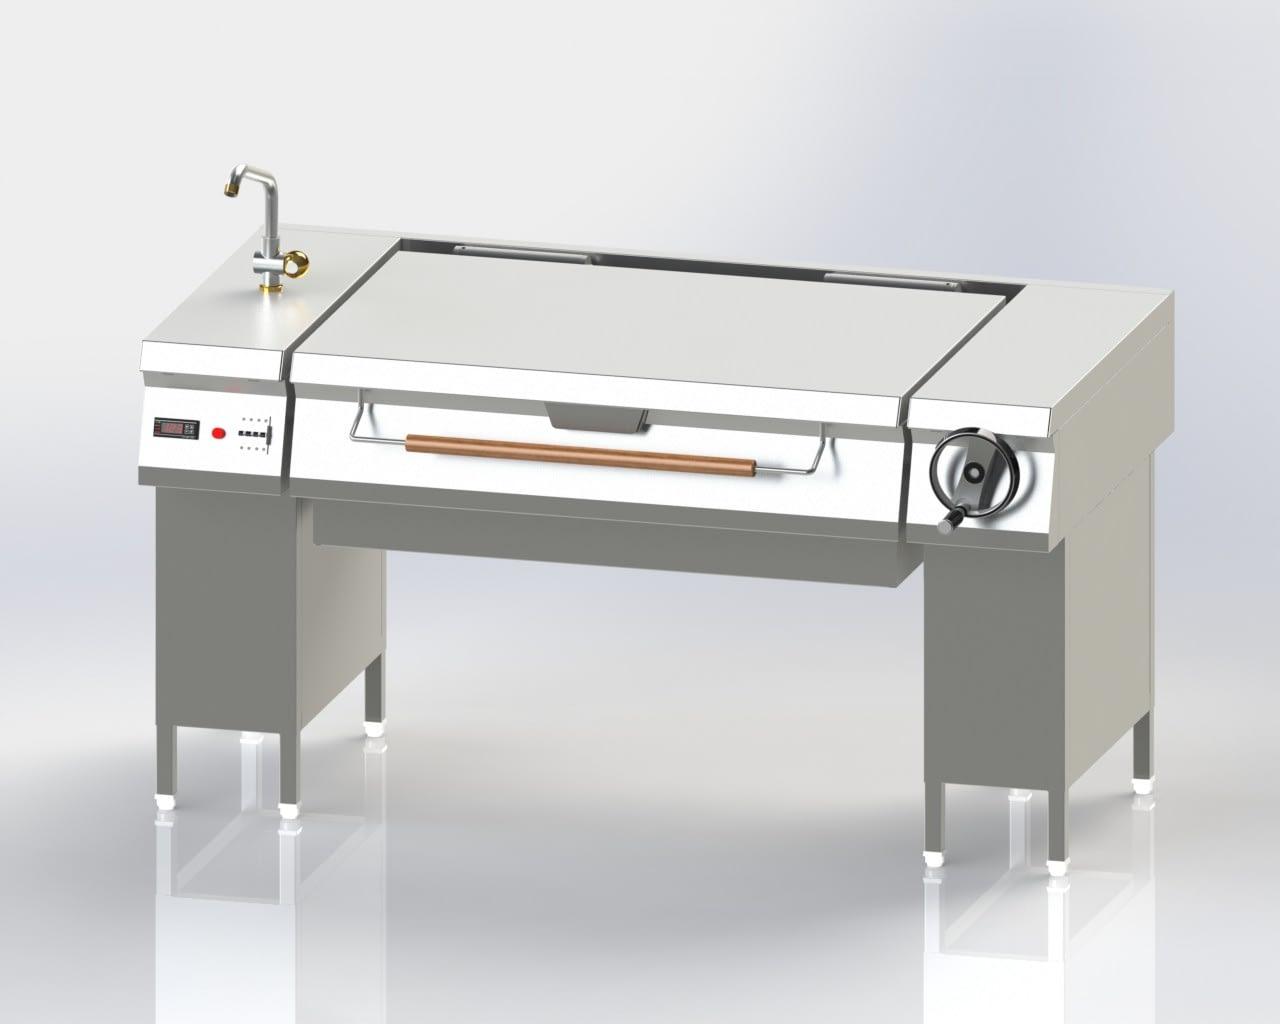 Tilting Bratt Pan (Electrical)